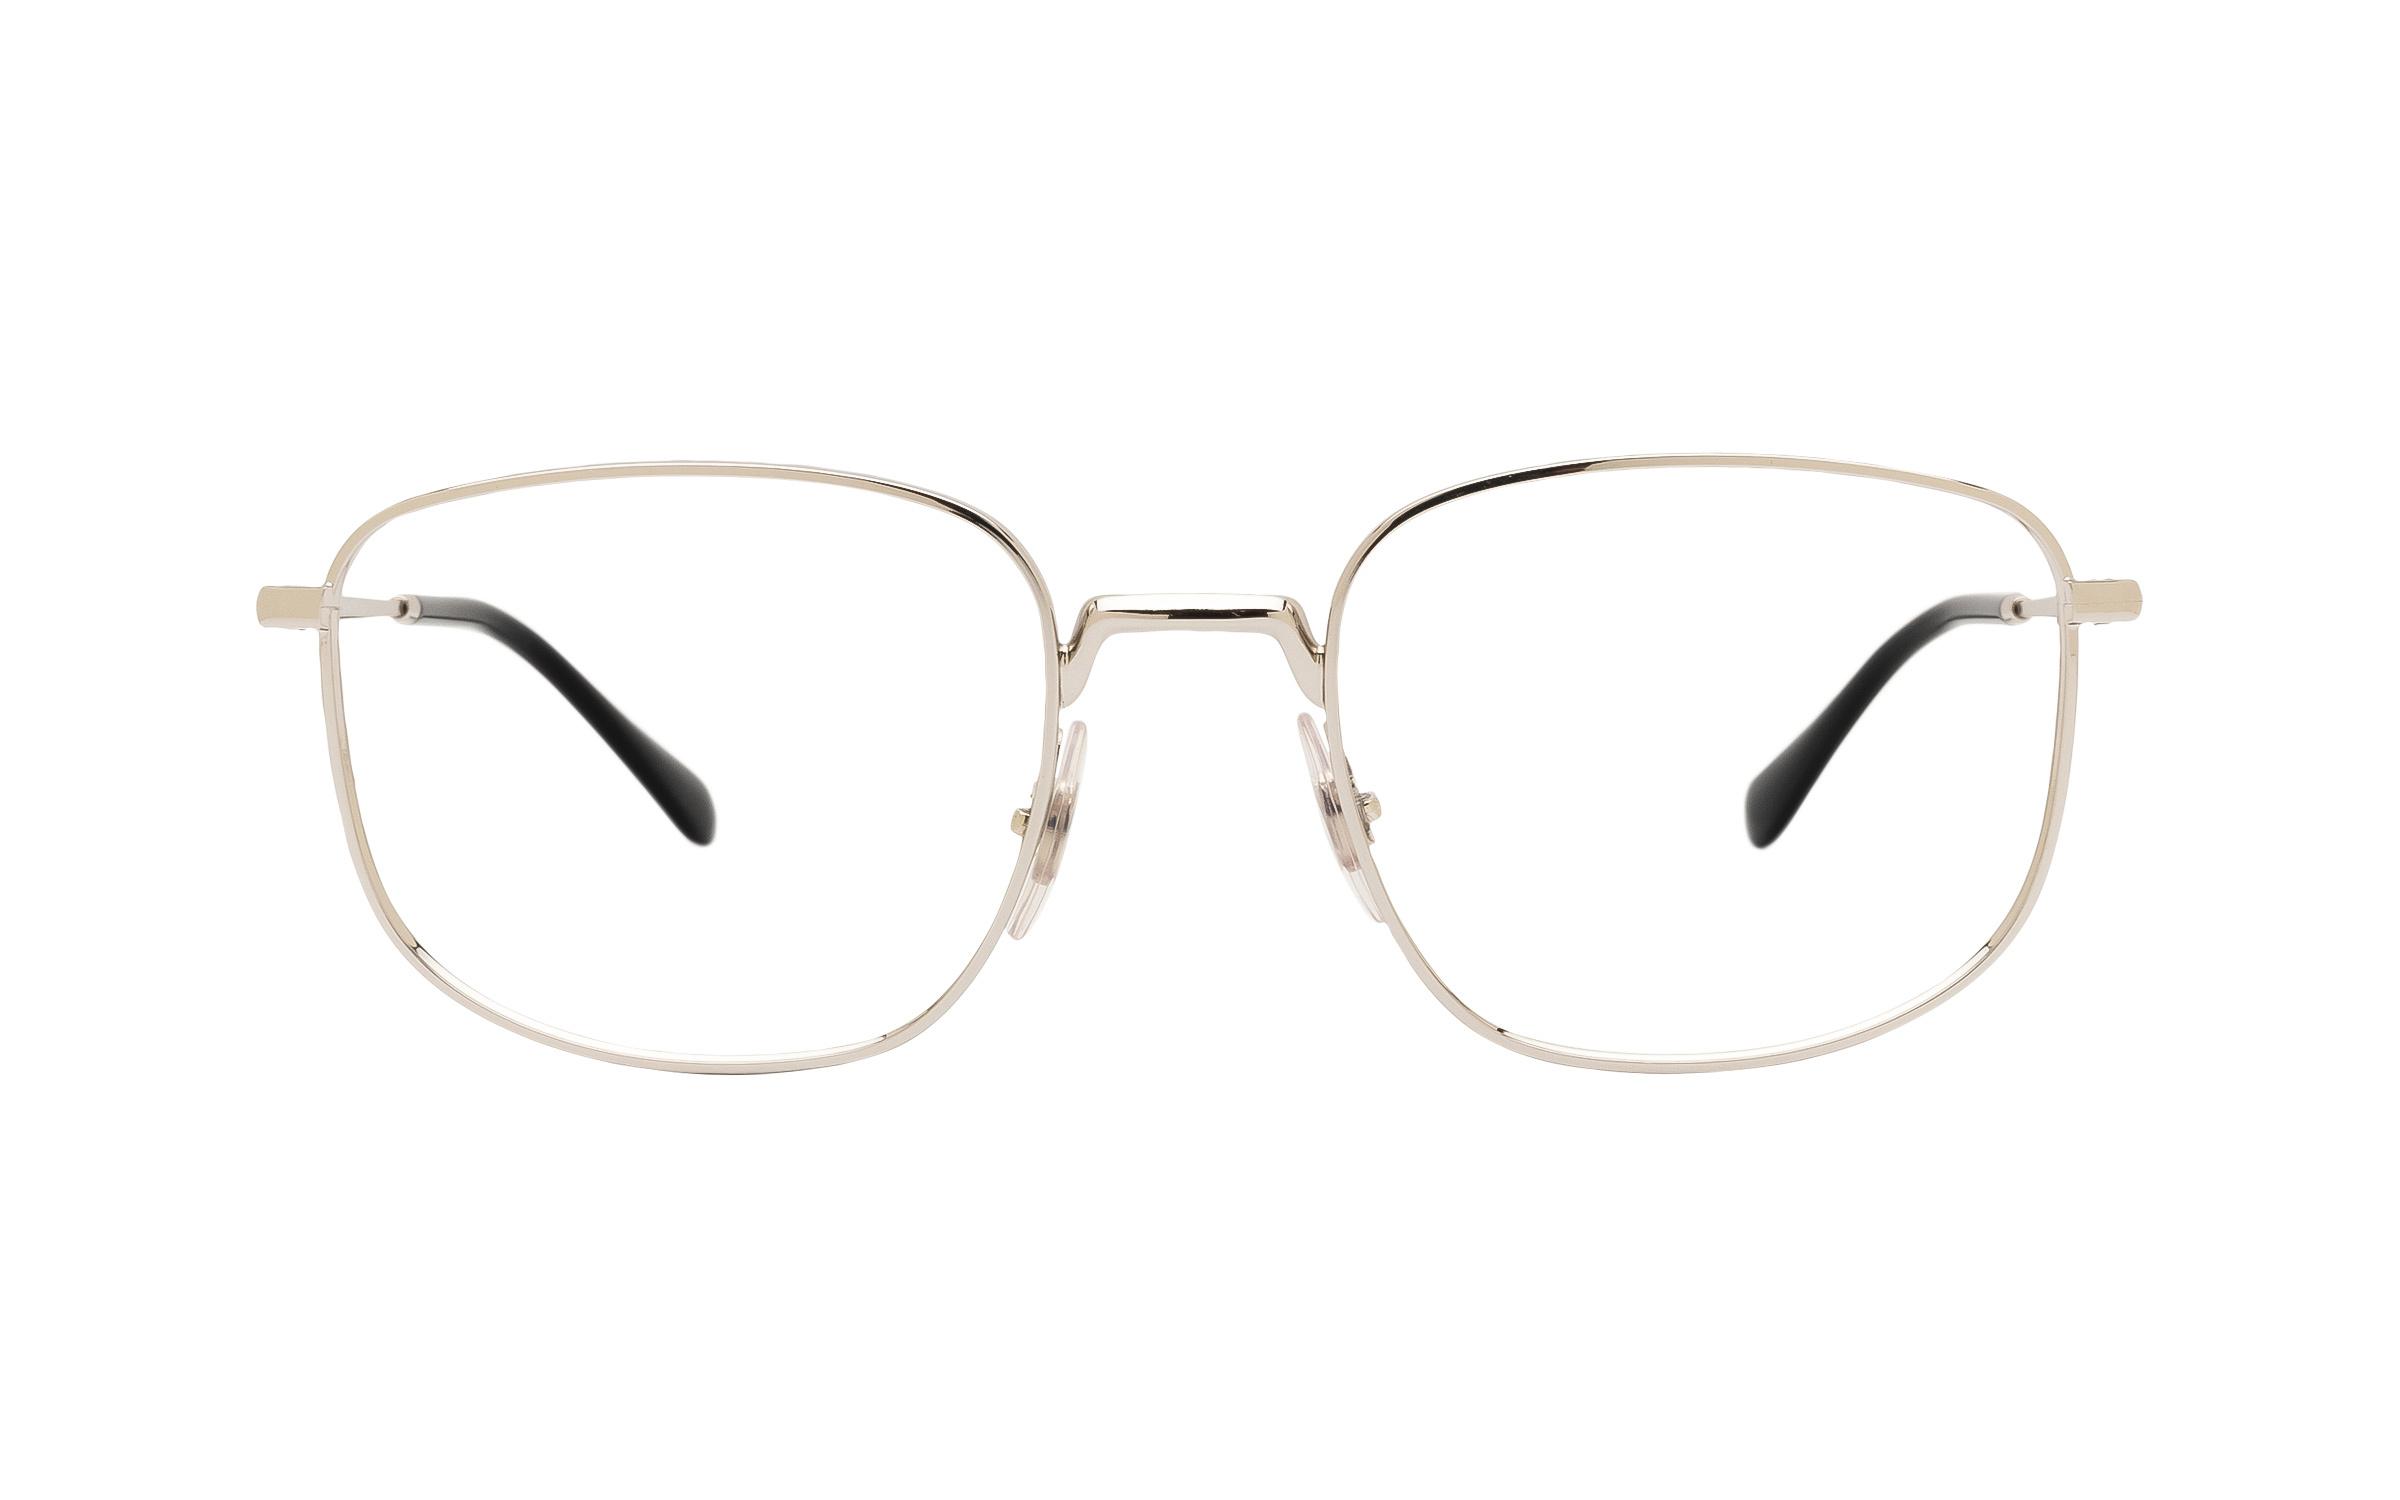 http://www.coastal.com/ - Ray-Ban RX6457 2501 (51) Eyeglasses and Frame in Silver | Metal – Online Coastal